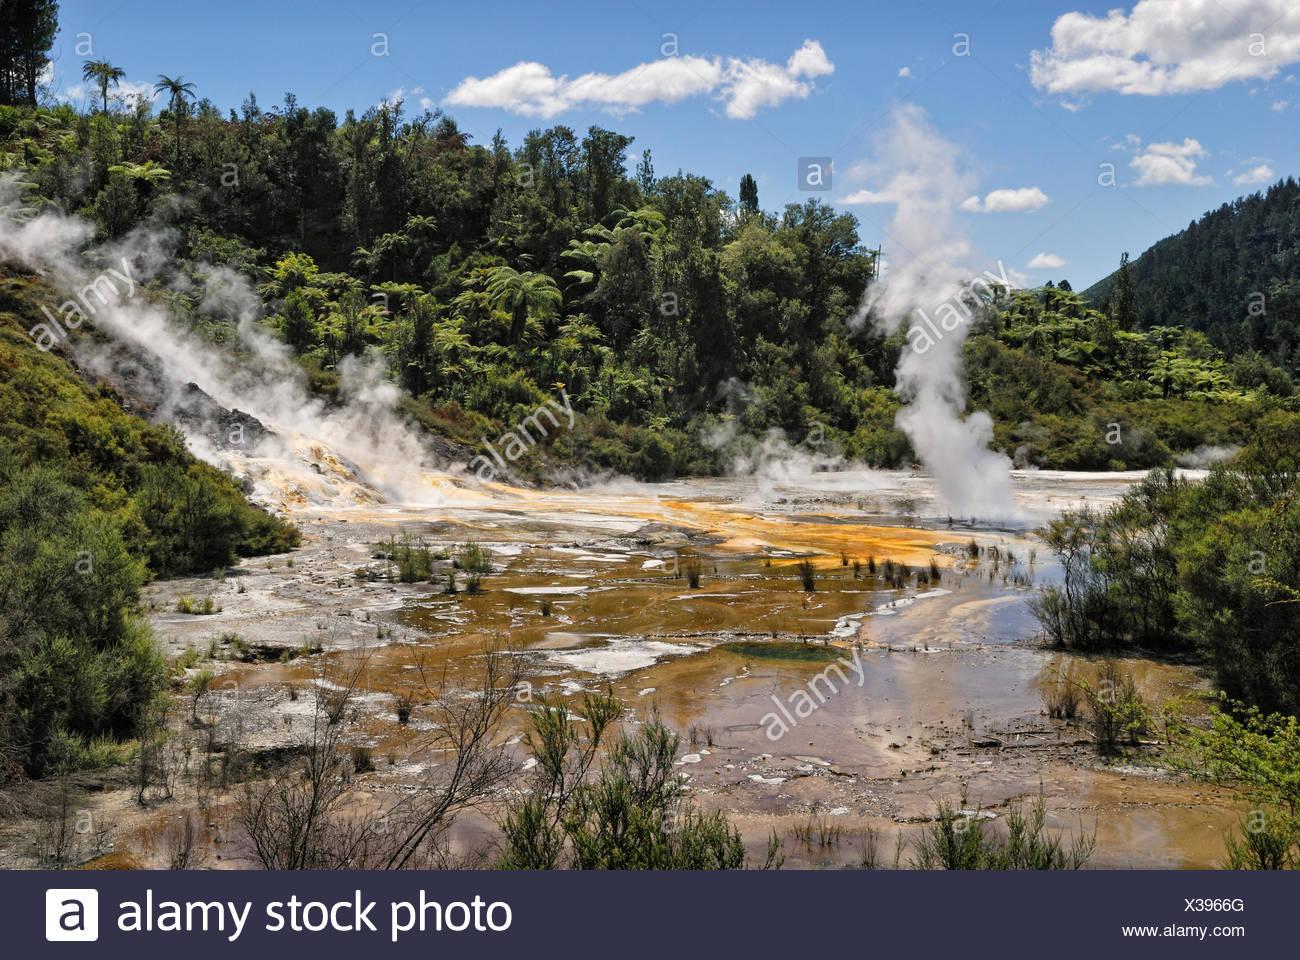 Artists Palette, Orakei Korako Cave and Thermal Park, Hidden Valley, Taopo-Rotorua, North Island, New Zealand - Stock Image